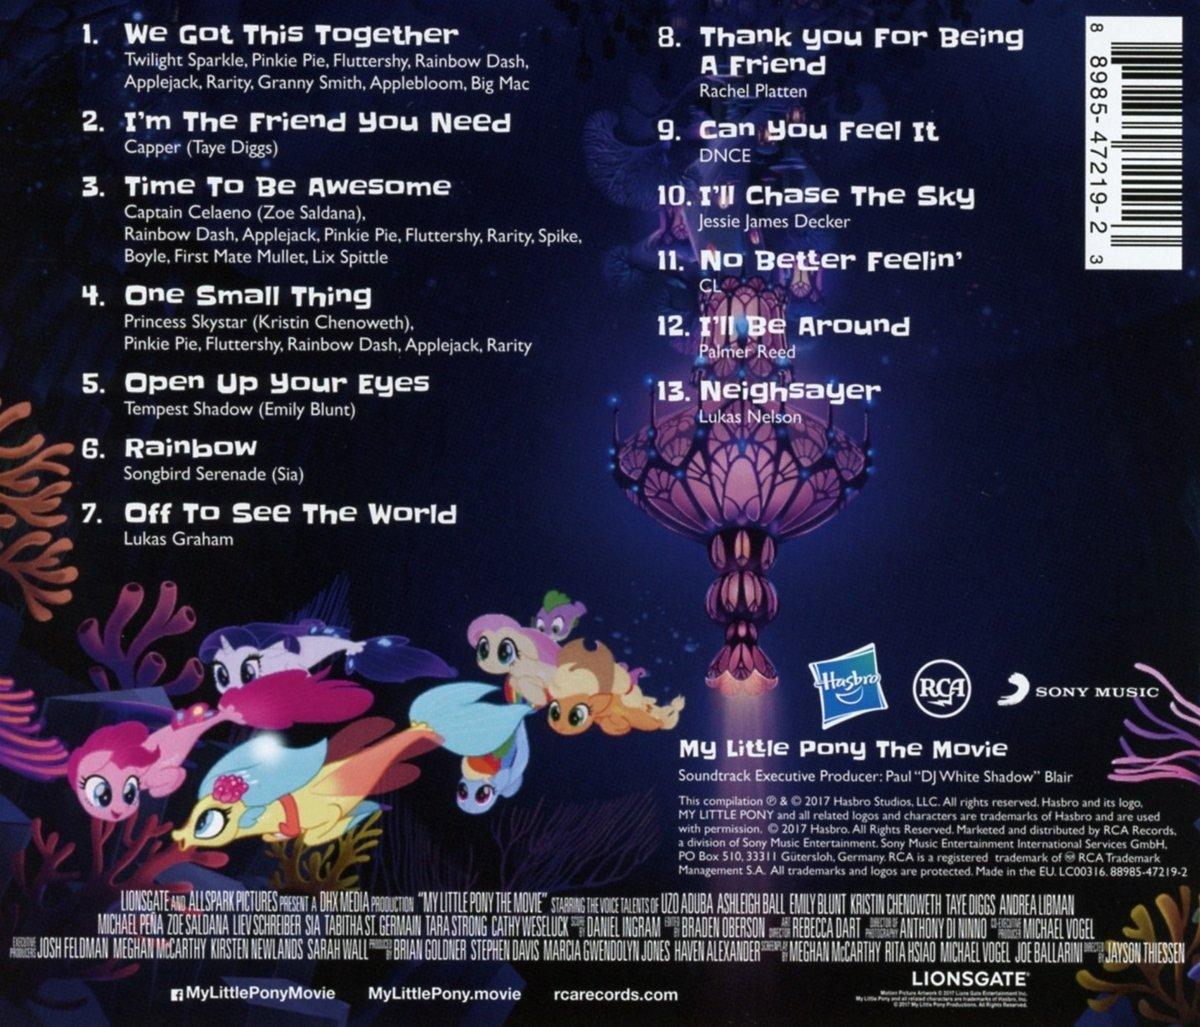 My little pony movie soundtrack download zip | My Little Pony